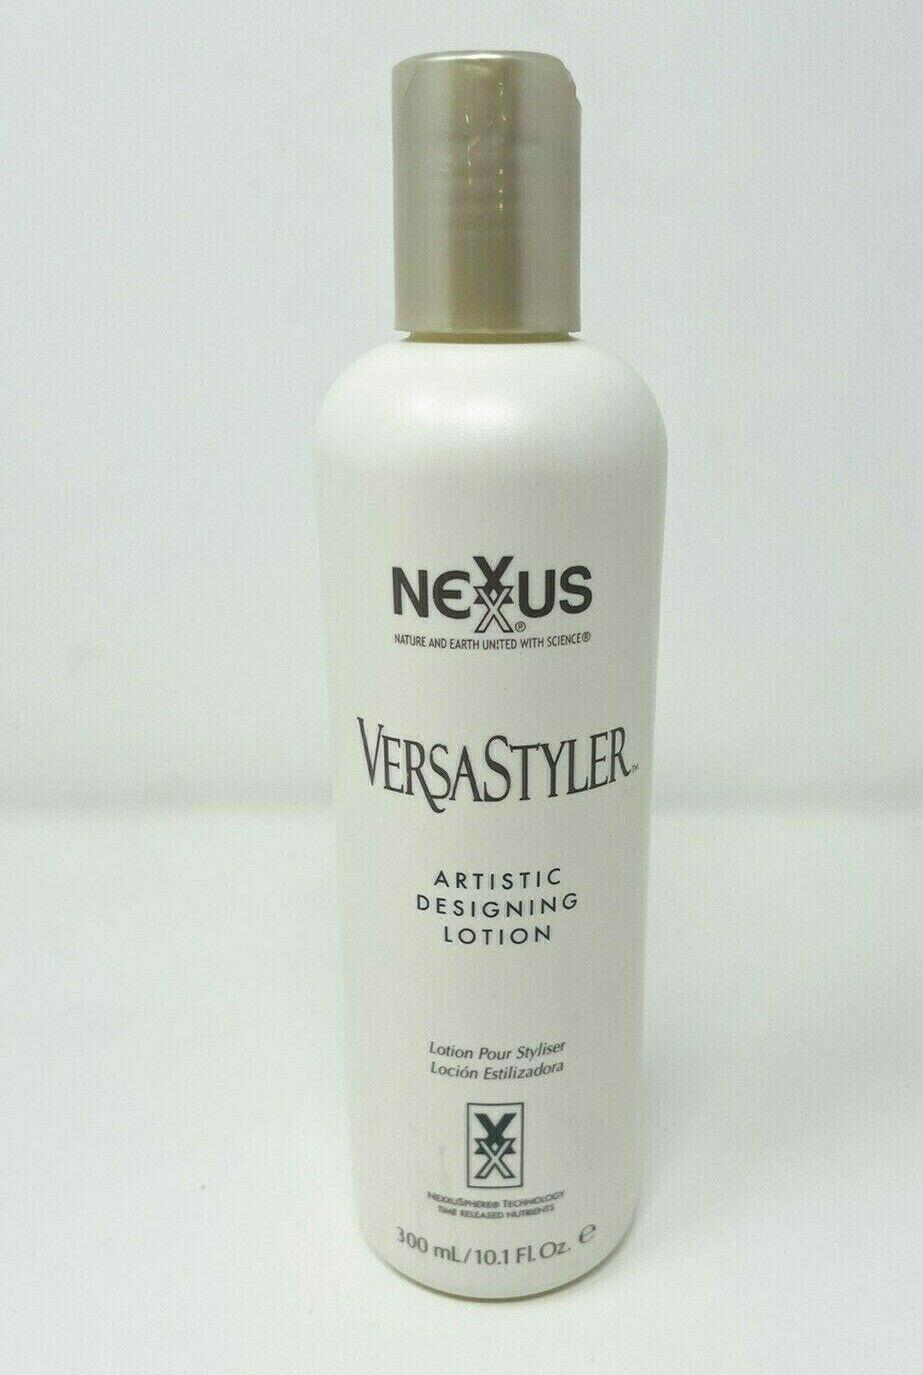 Nexxus Versastyler Artistic Designing Lotion 10.1oz Bottle FULL Hair Product - $99.99